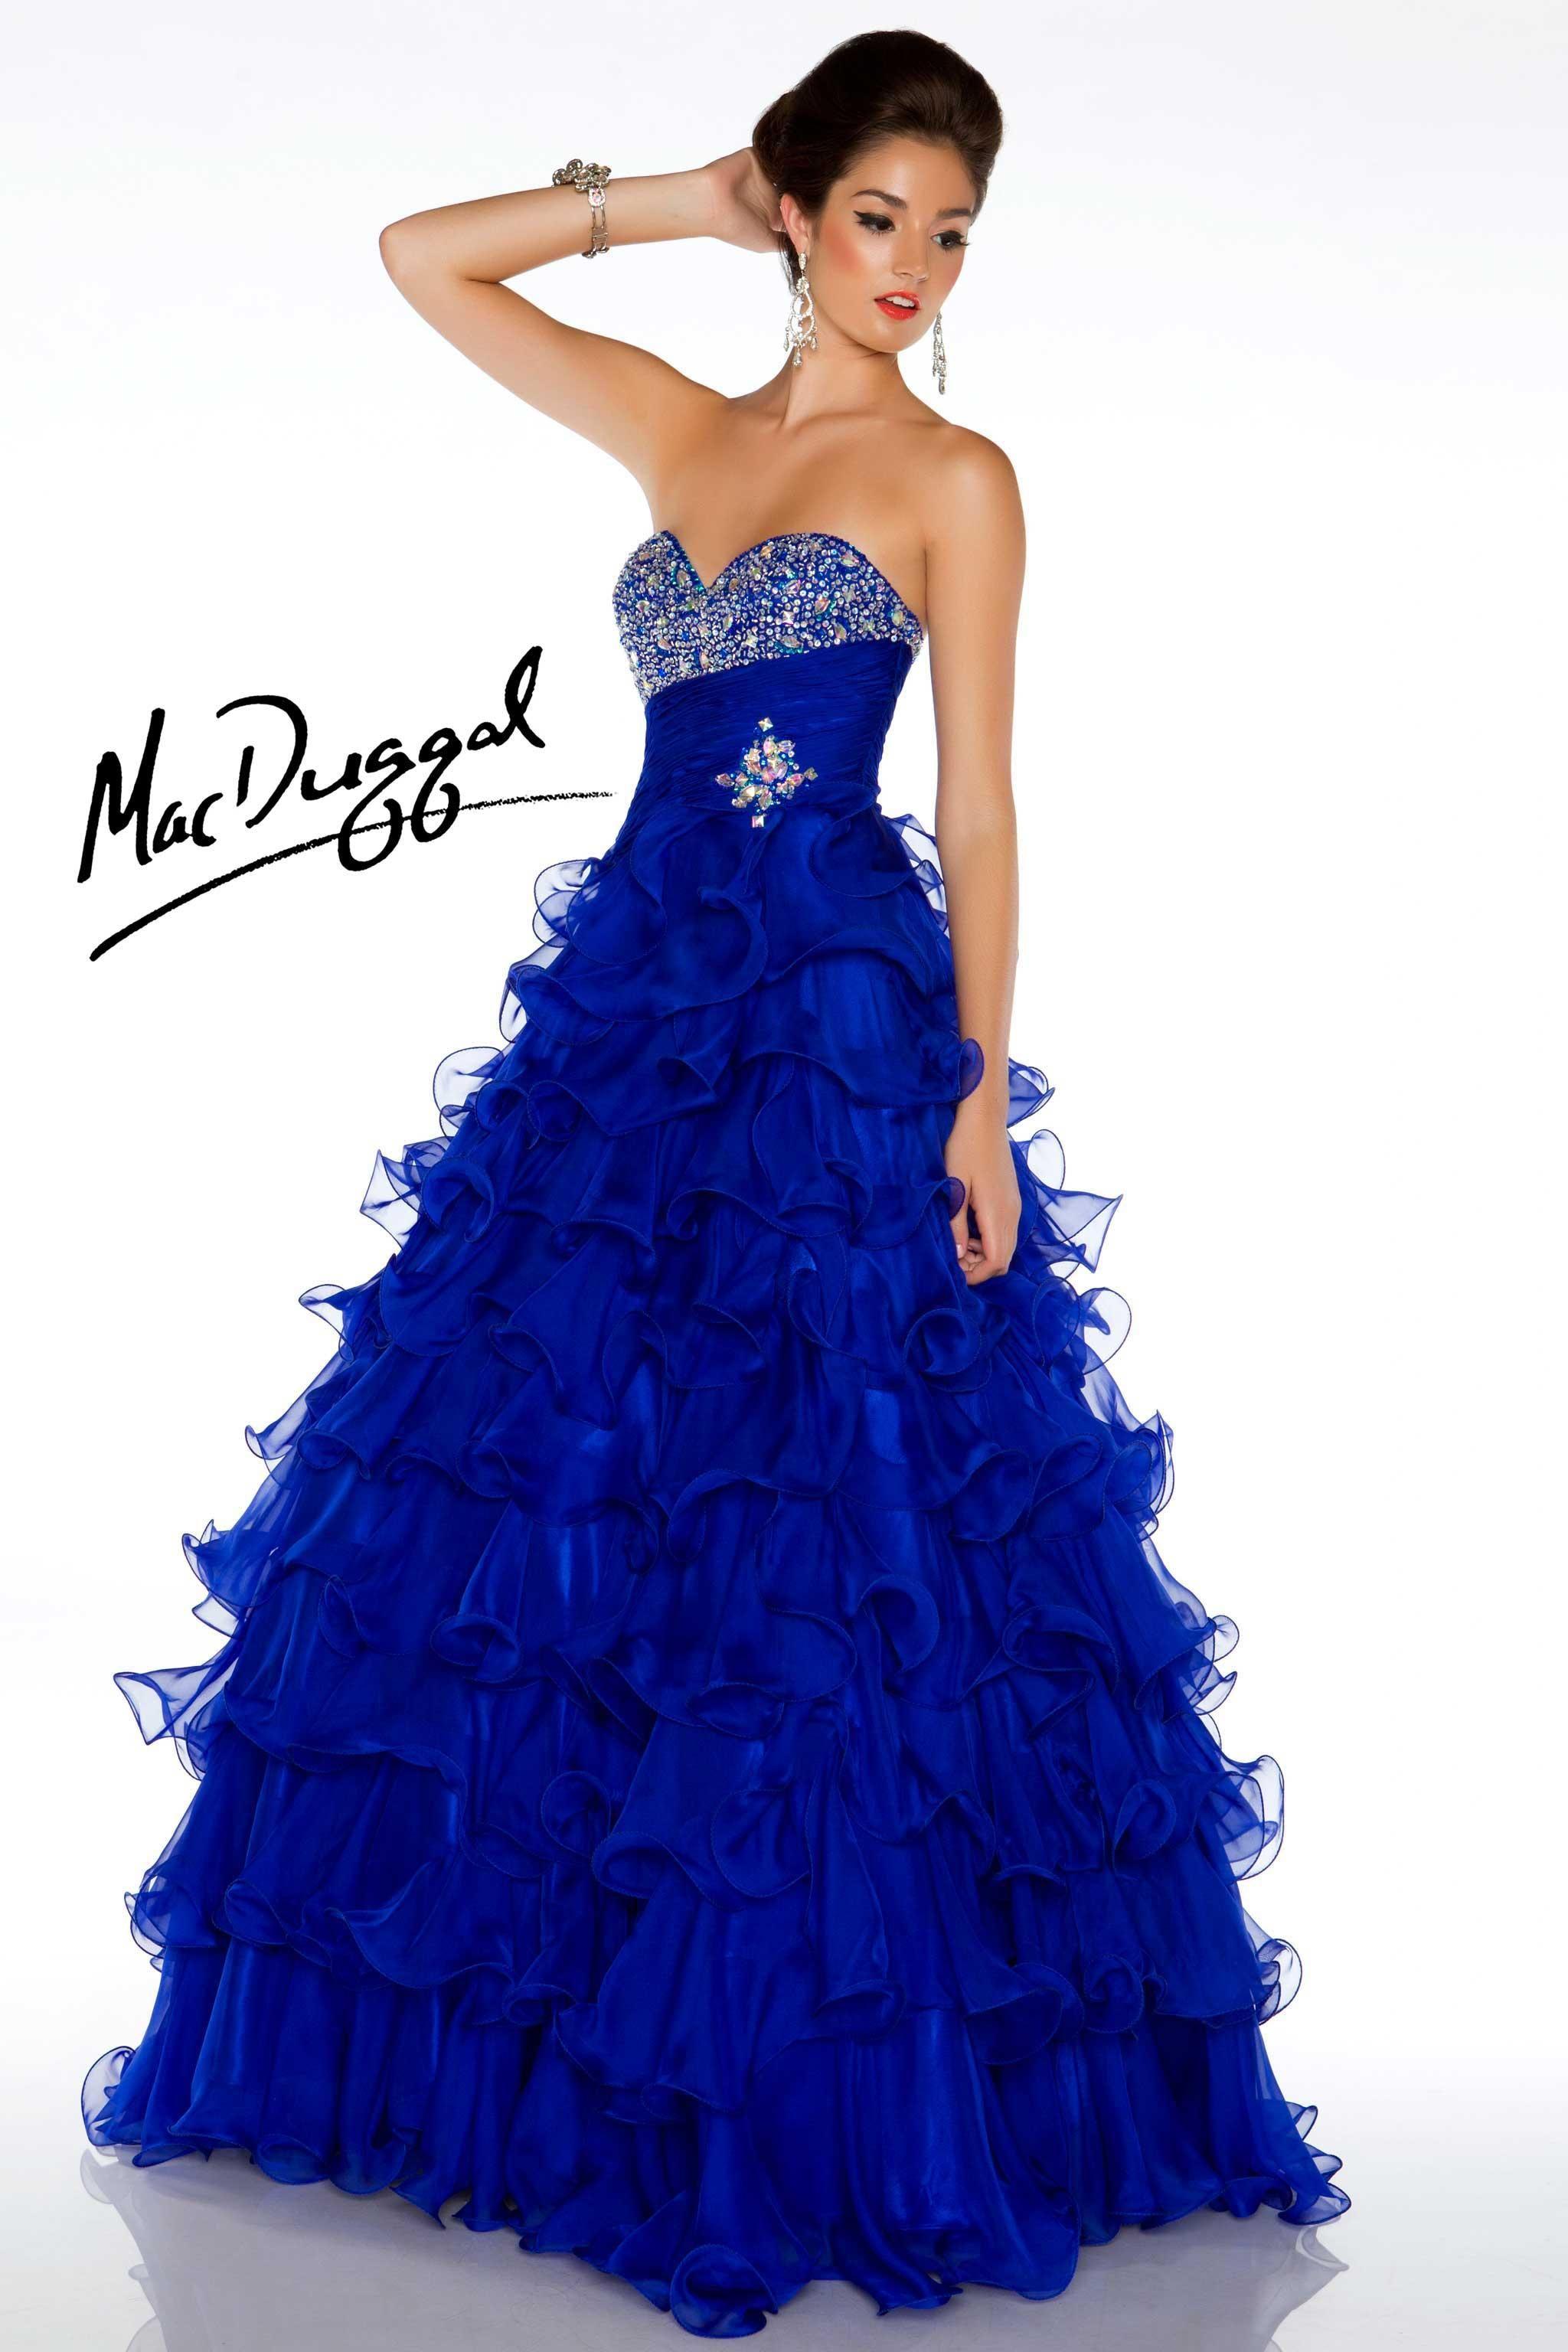 Cobalt blue Ball Gown with Ruffled Skirt mcduggal 4951H | All ...